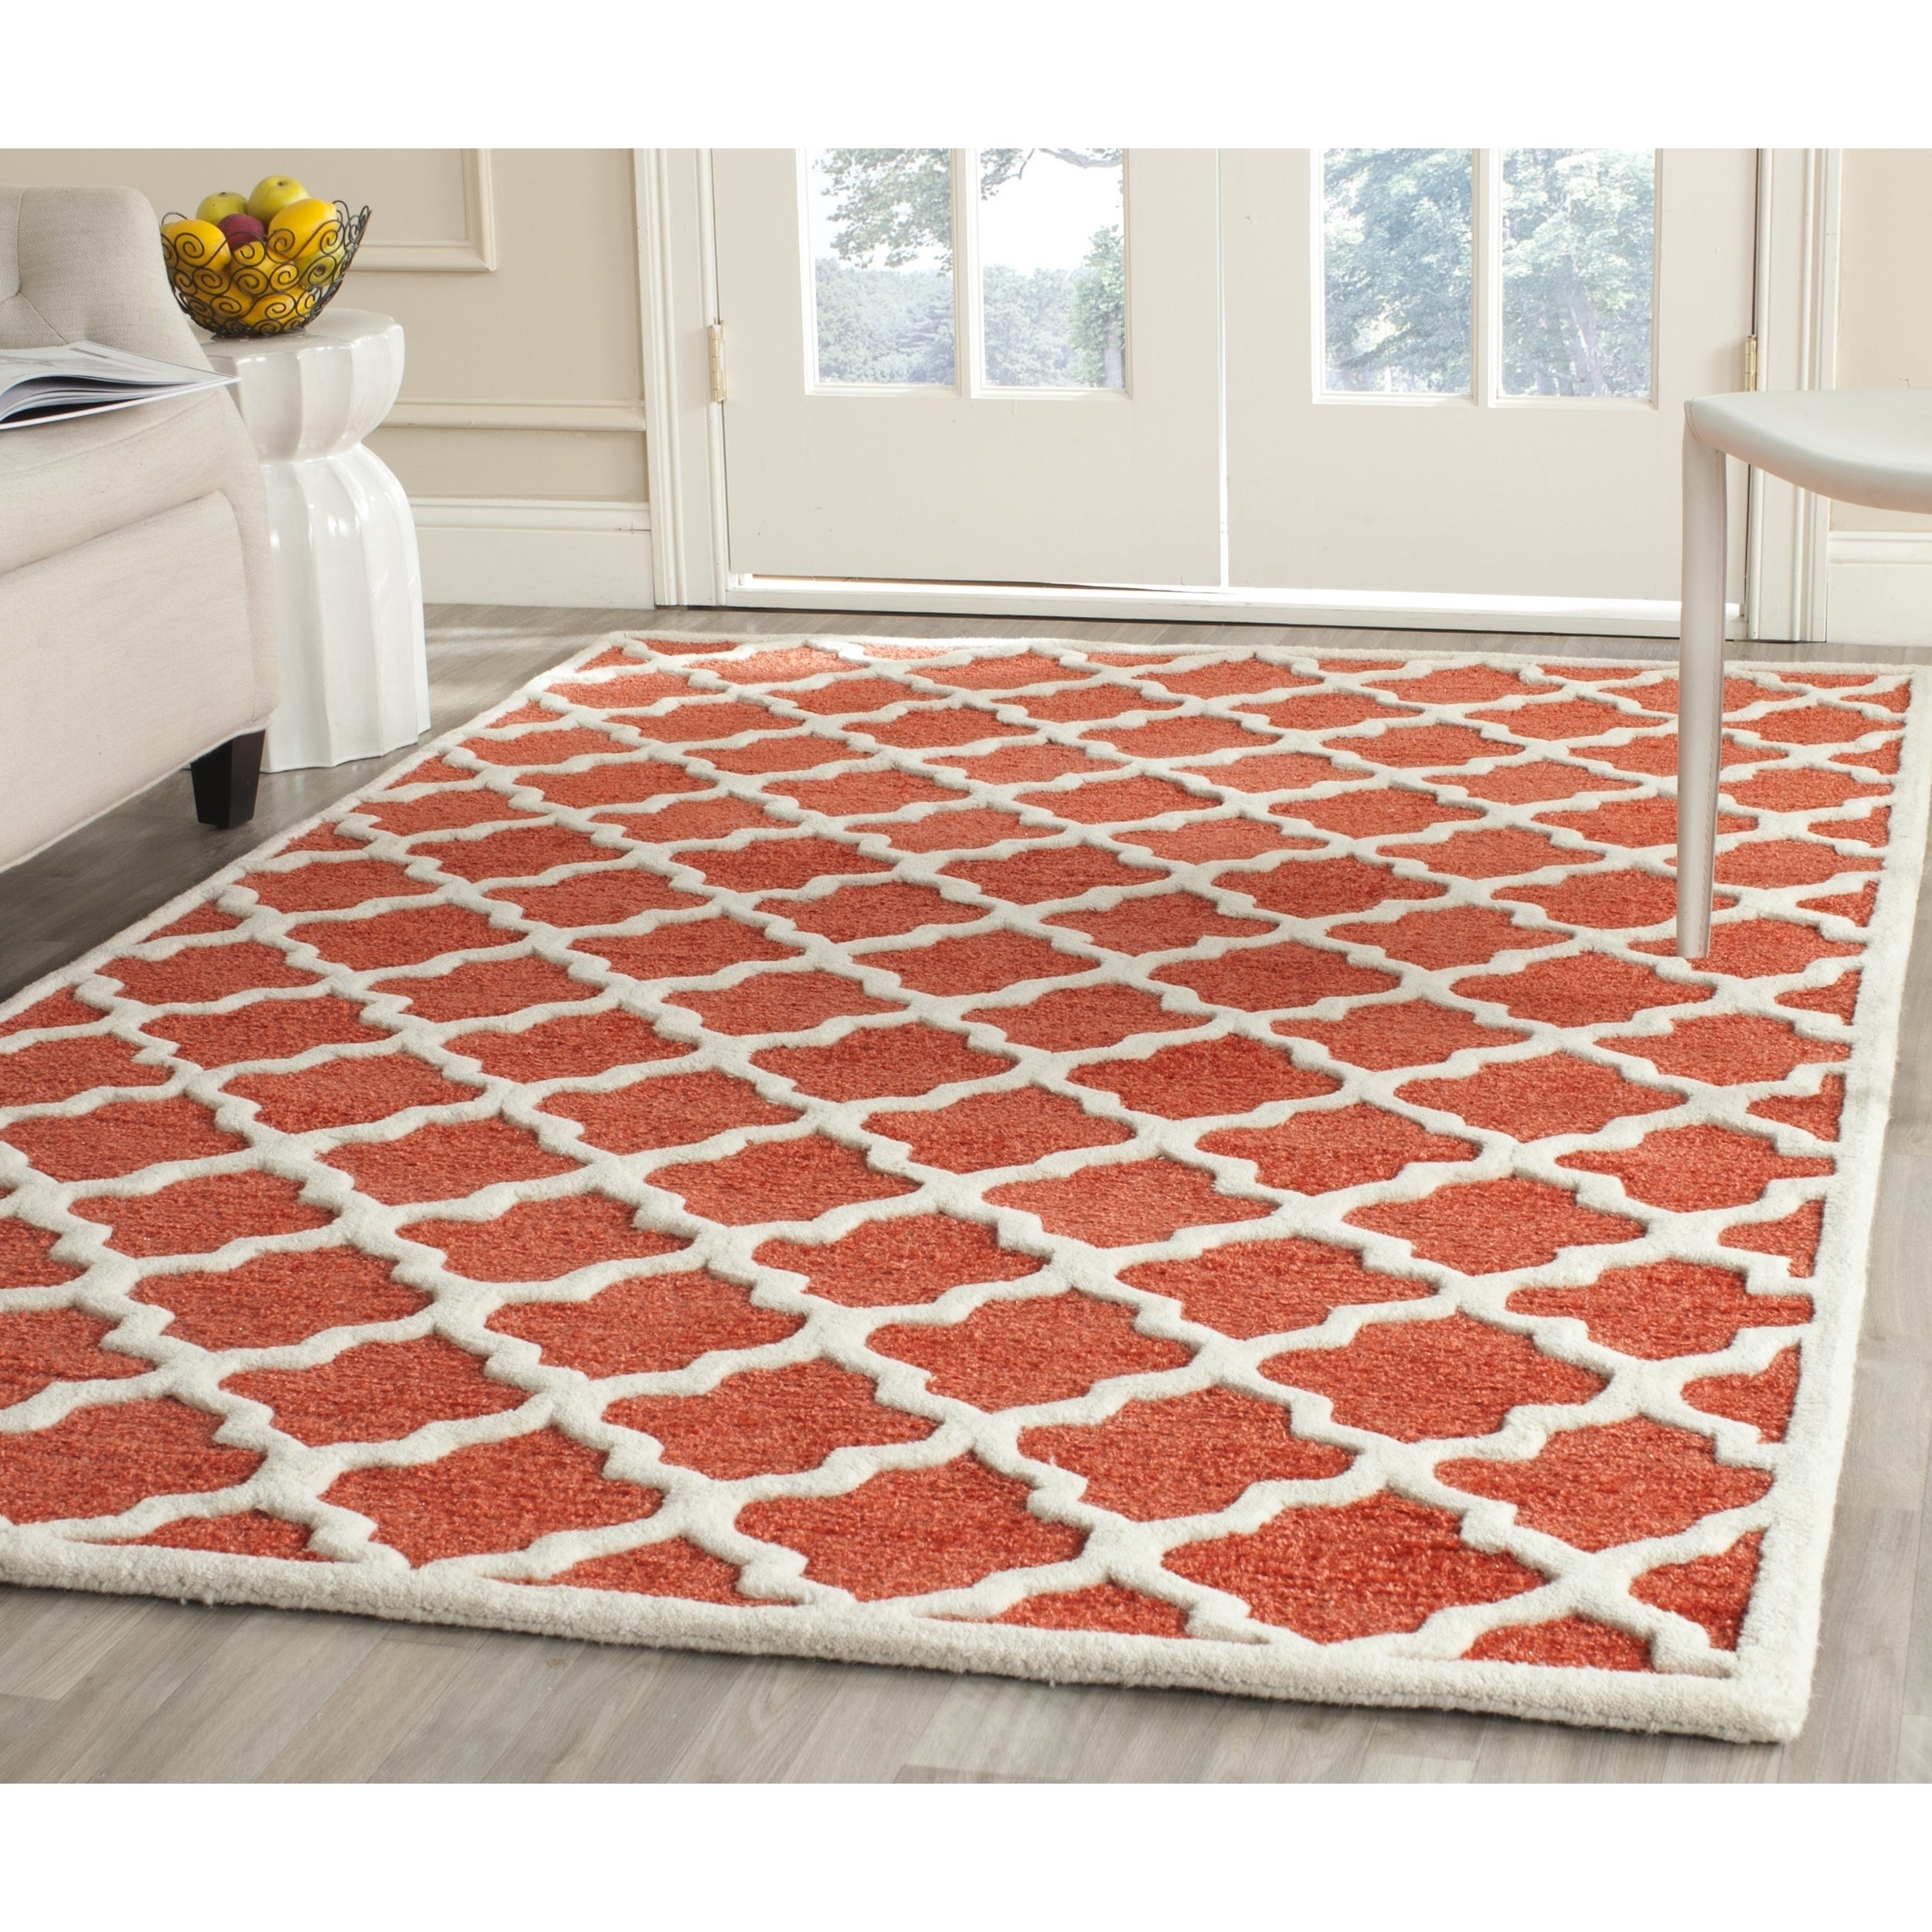 Safavieh Handmade Precious Rose Polyester/ Wool Rug (8' x...